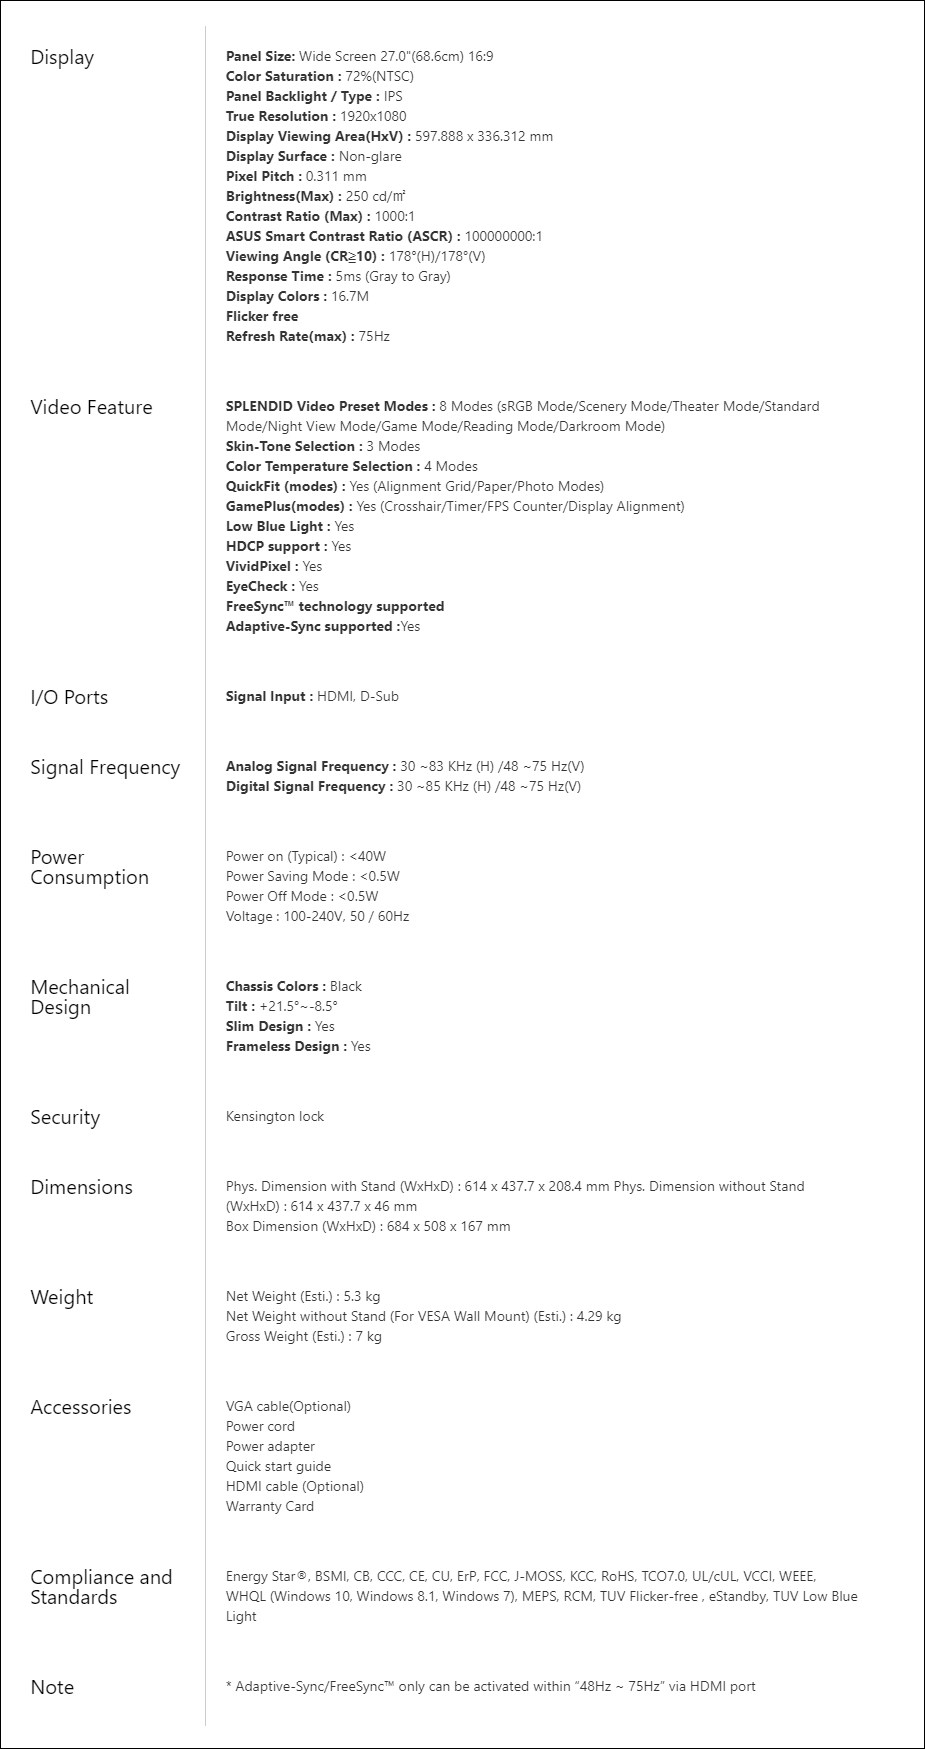 asus-vl279he-27-75hz-full-hd-freesync-eye-care-ips-monitor-ac27426-6.jpg